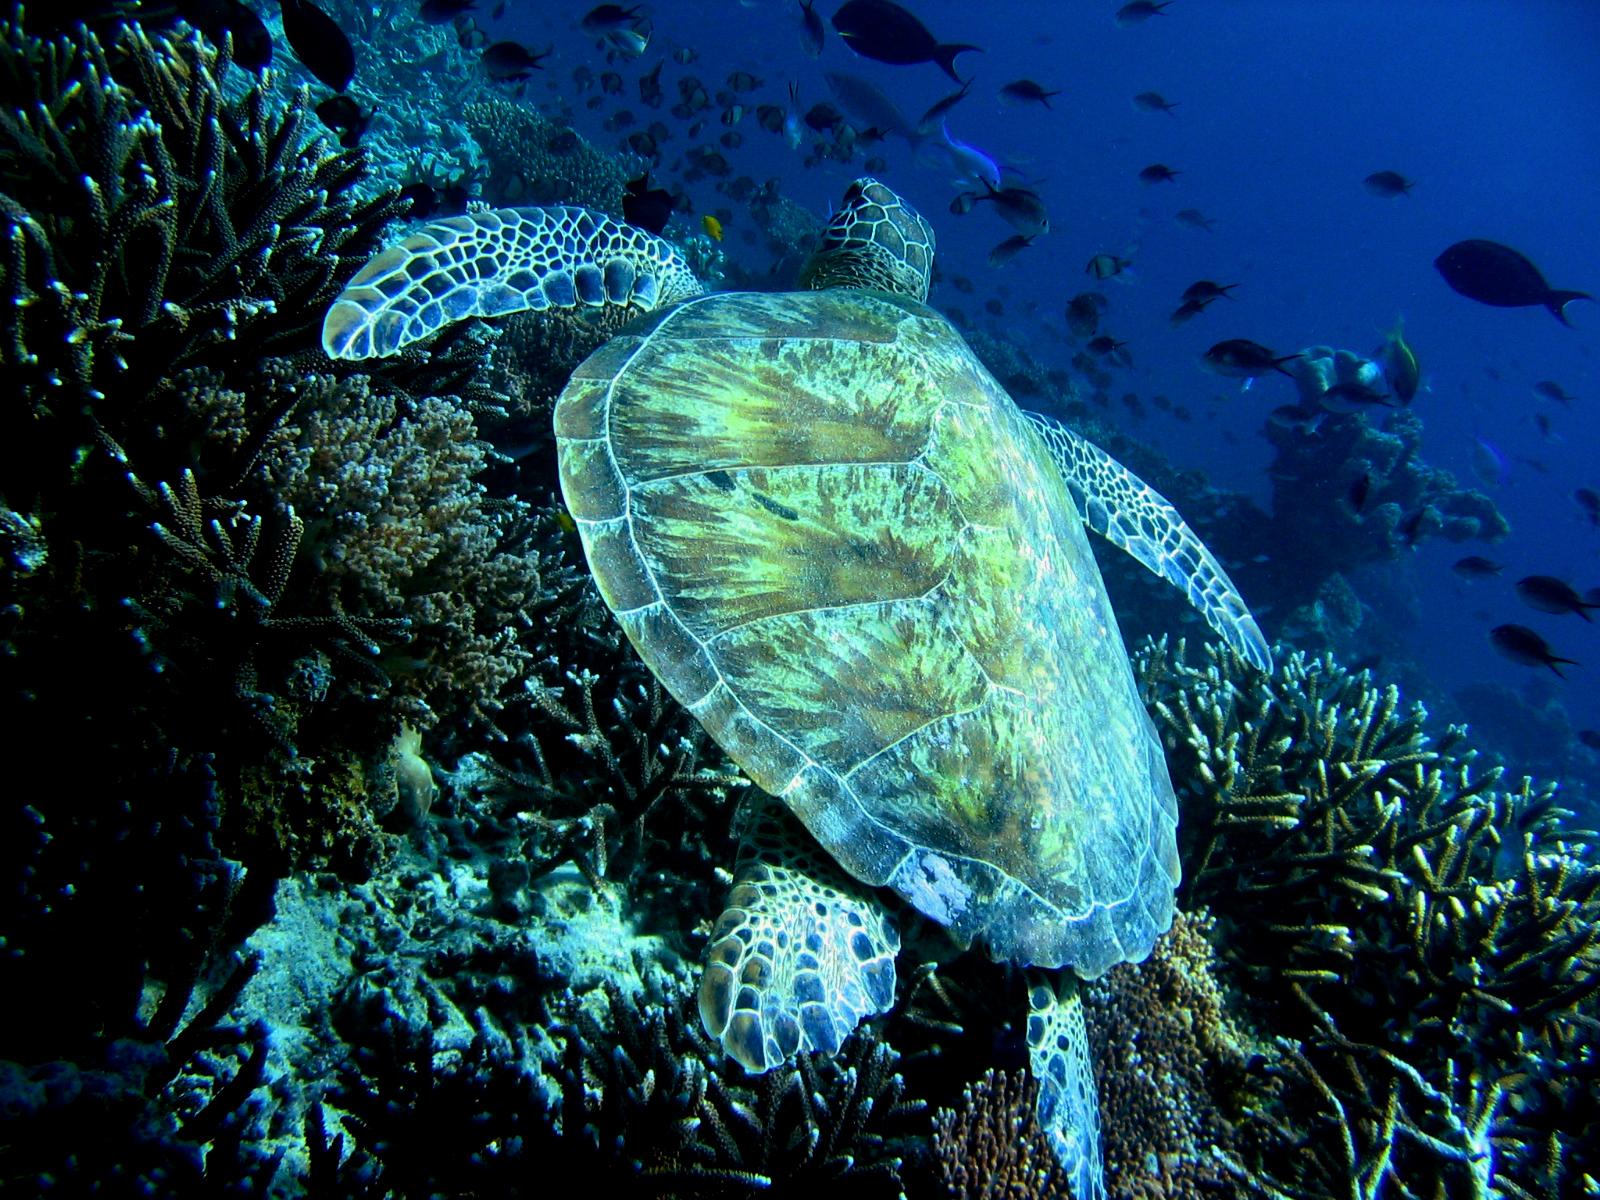 Malaysian turtle, Animals, Aquarium, Bspo06, Fish, HQ Photo